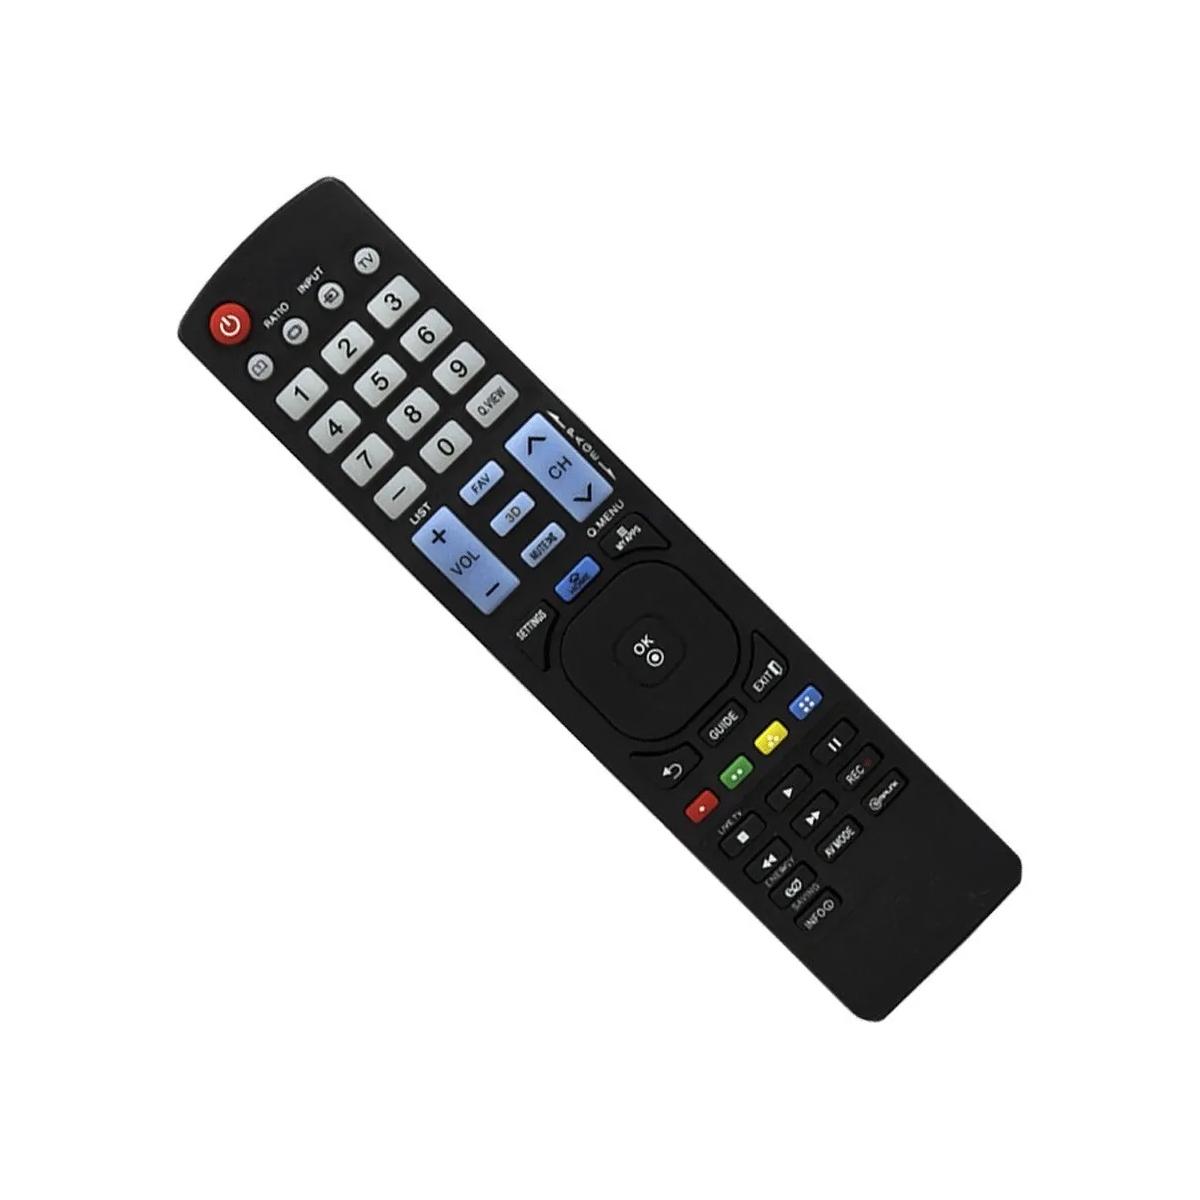 Controle Remoto Tv Lcd Led 3d Smart Lg LM7600 47LM7600 55LM7600 47LM8600 42LM6200 47LM6200